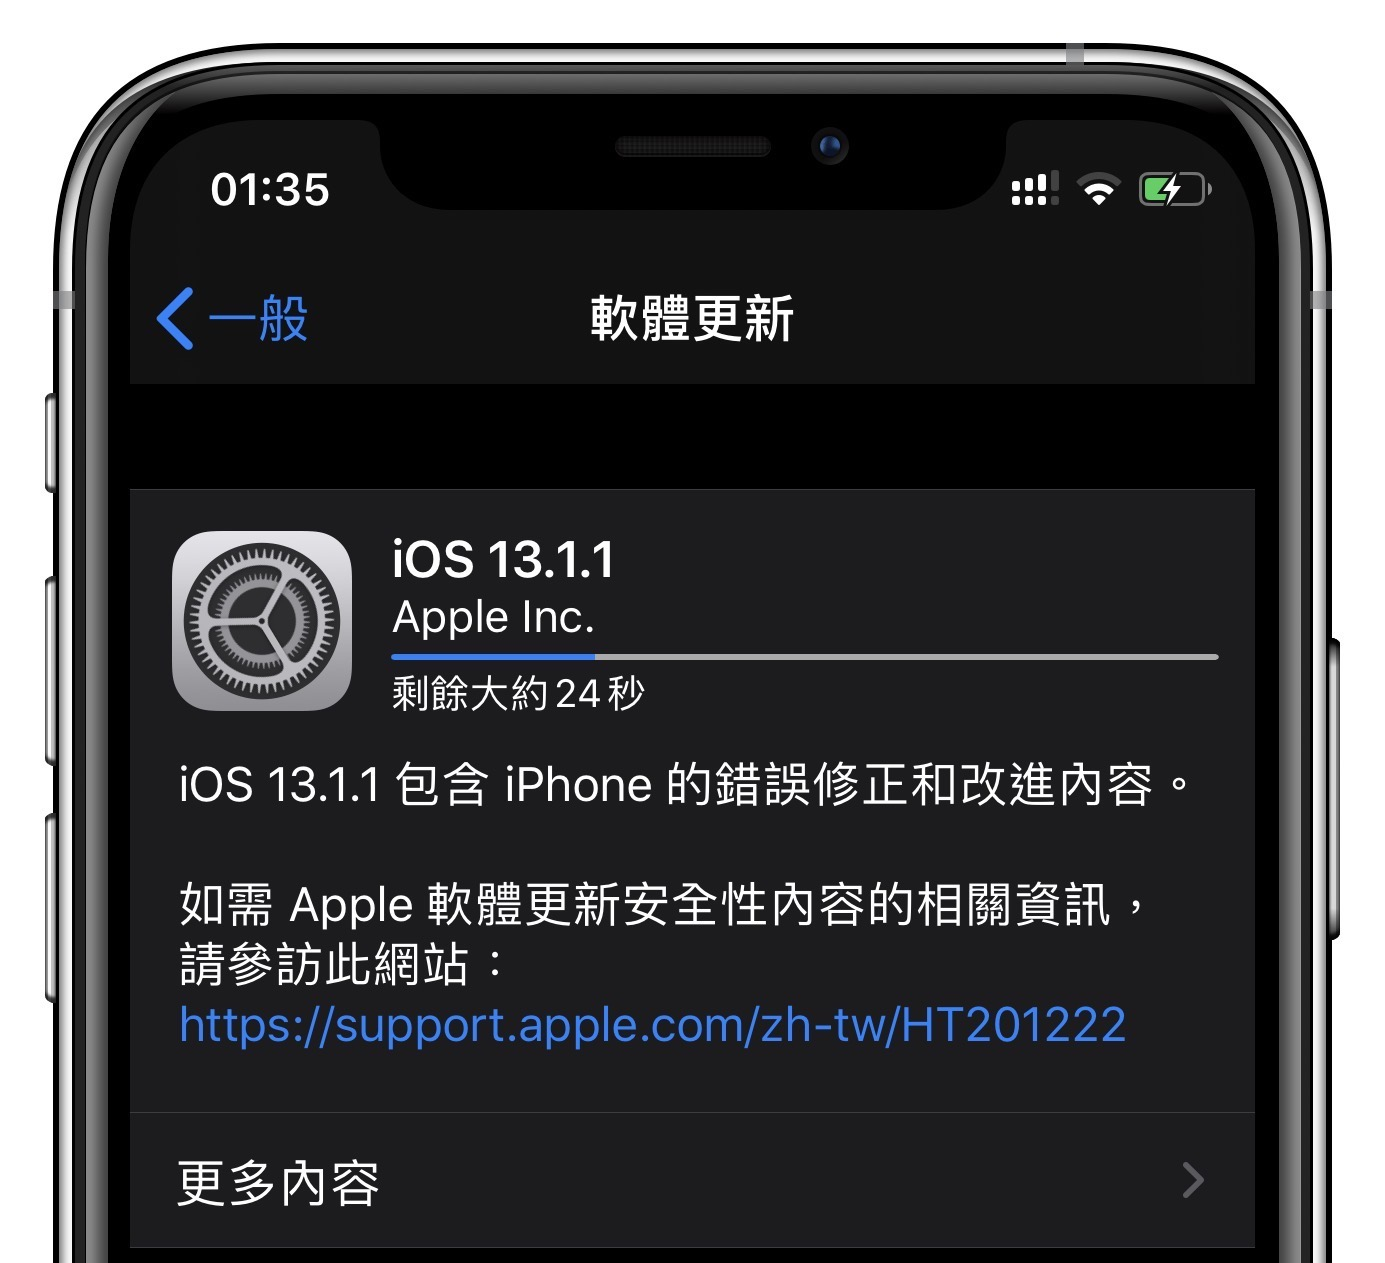 iOS 13.1.1 更新